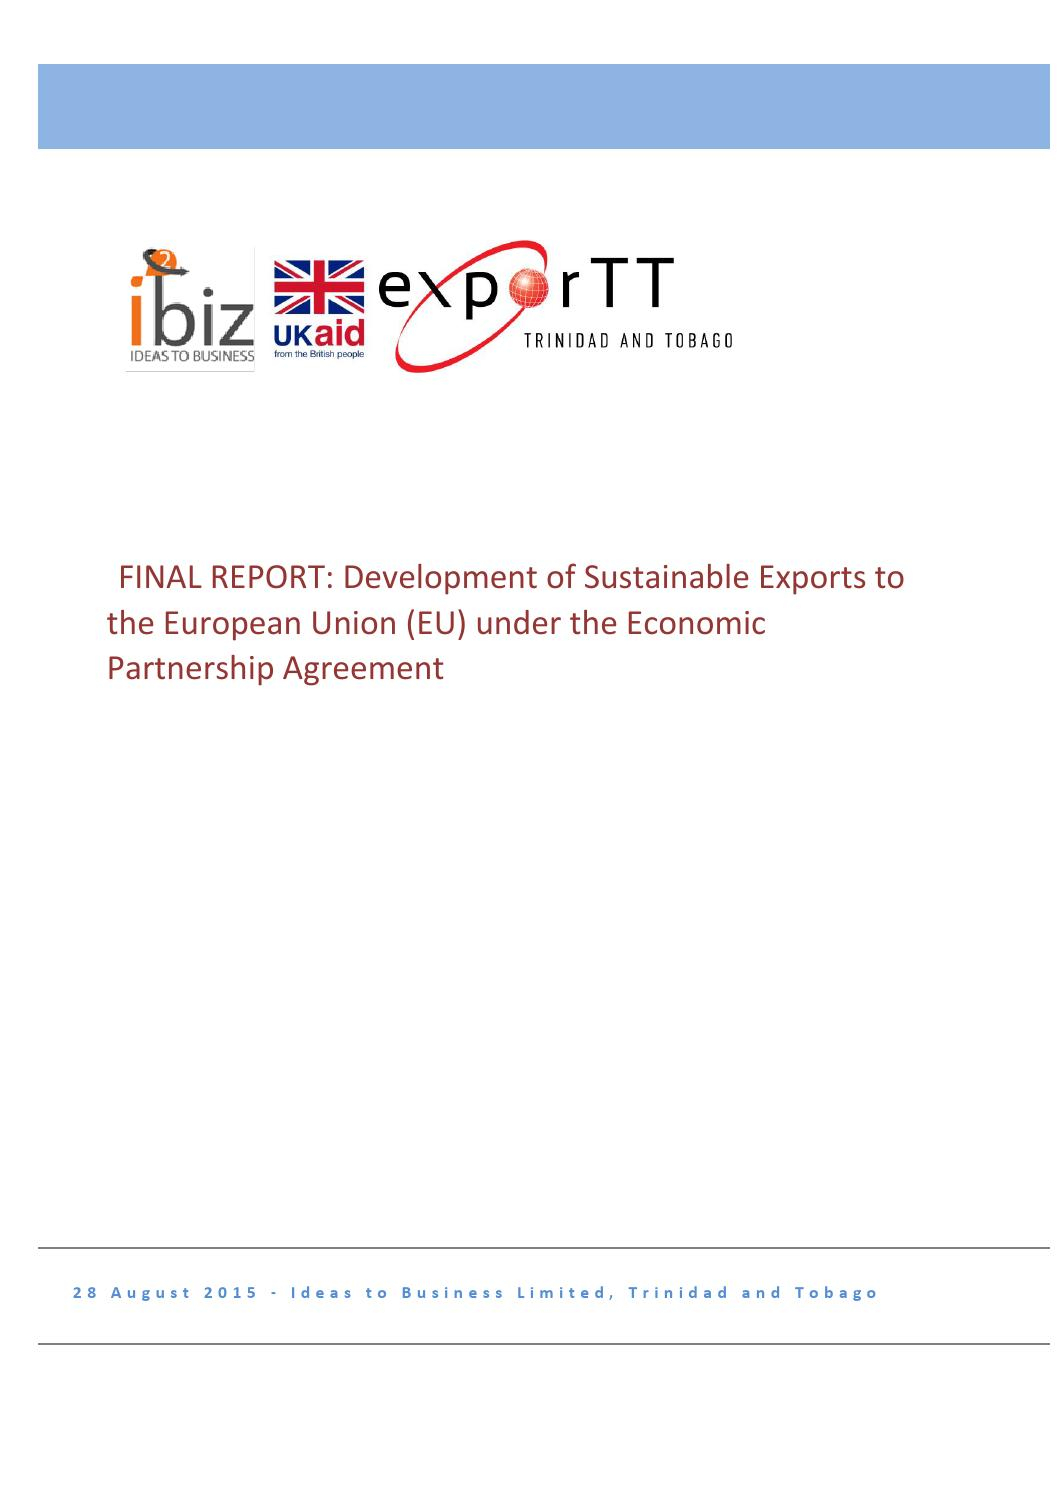 Services Market Survey Reportexporttltd – Issuu Intended For Rapides Parish Archived Calendar 2014